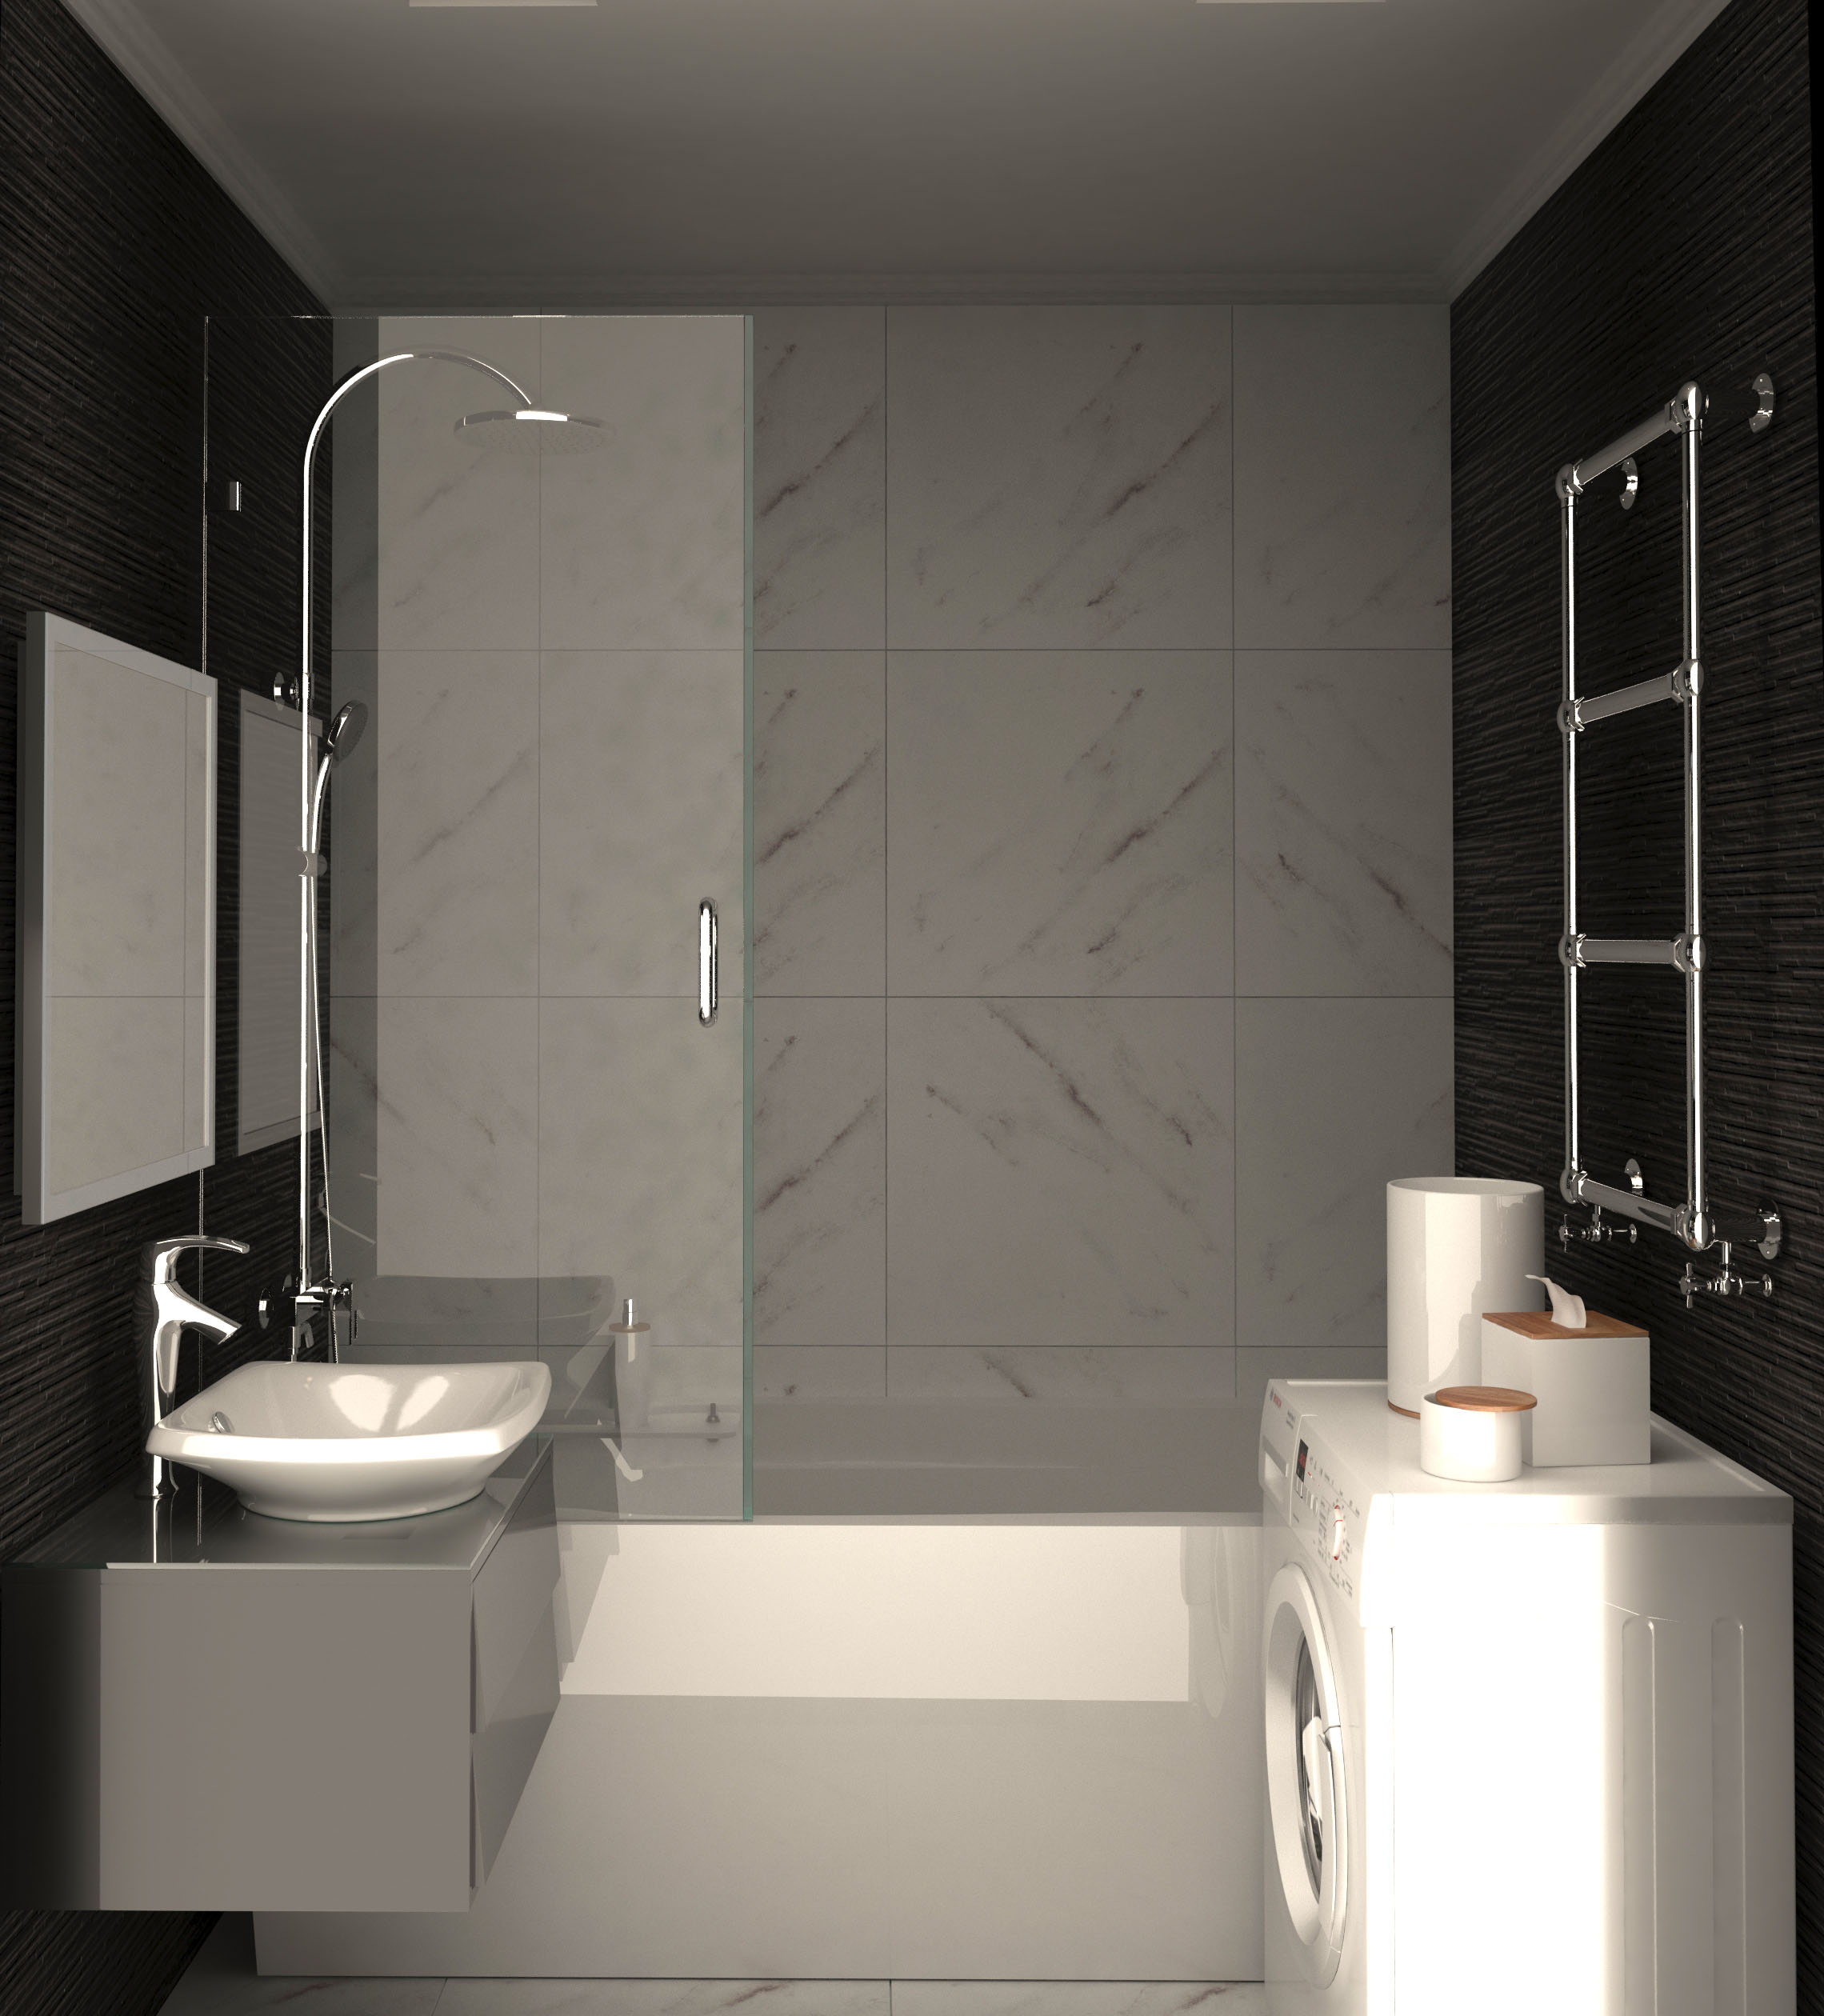 Ванная комната Южное Бутово